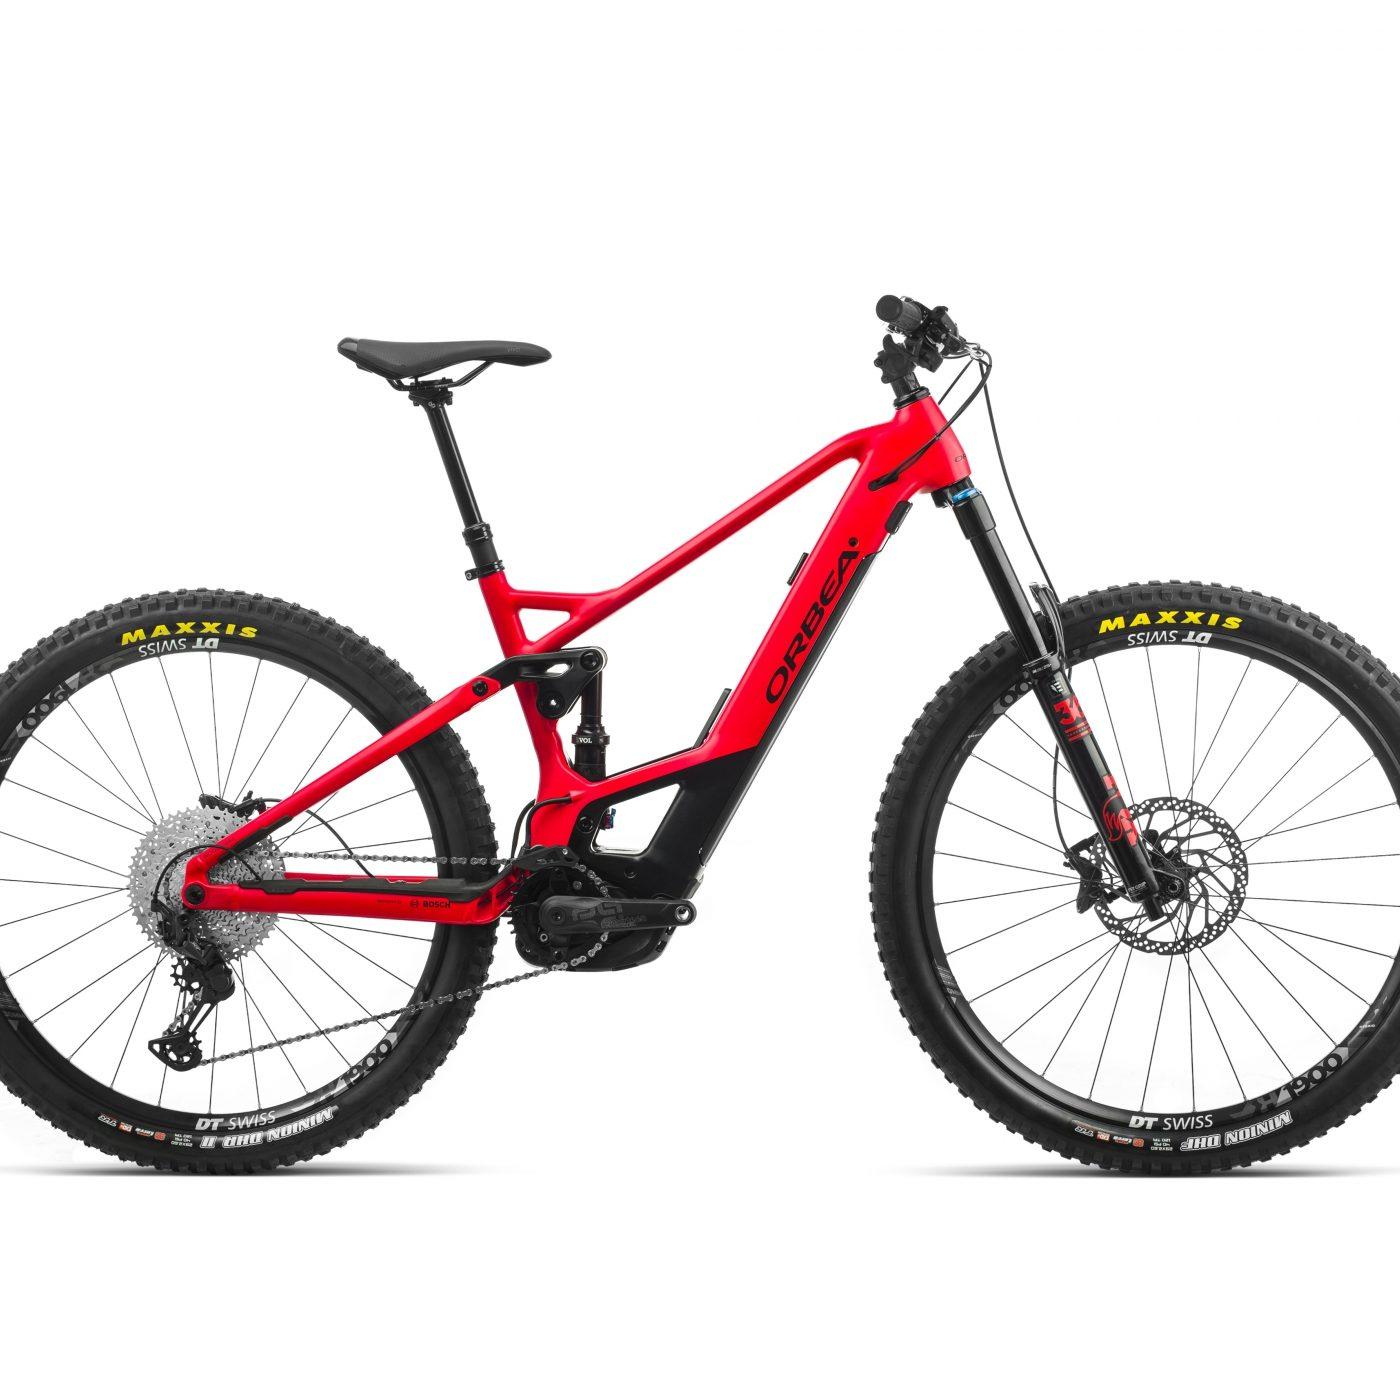 ORBEA WILD FS H15 eBike - BRIGHTRED / ZWART (DOF) @G-Bikes